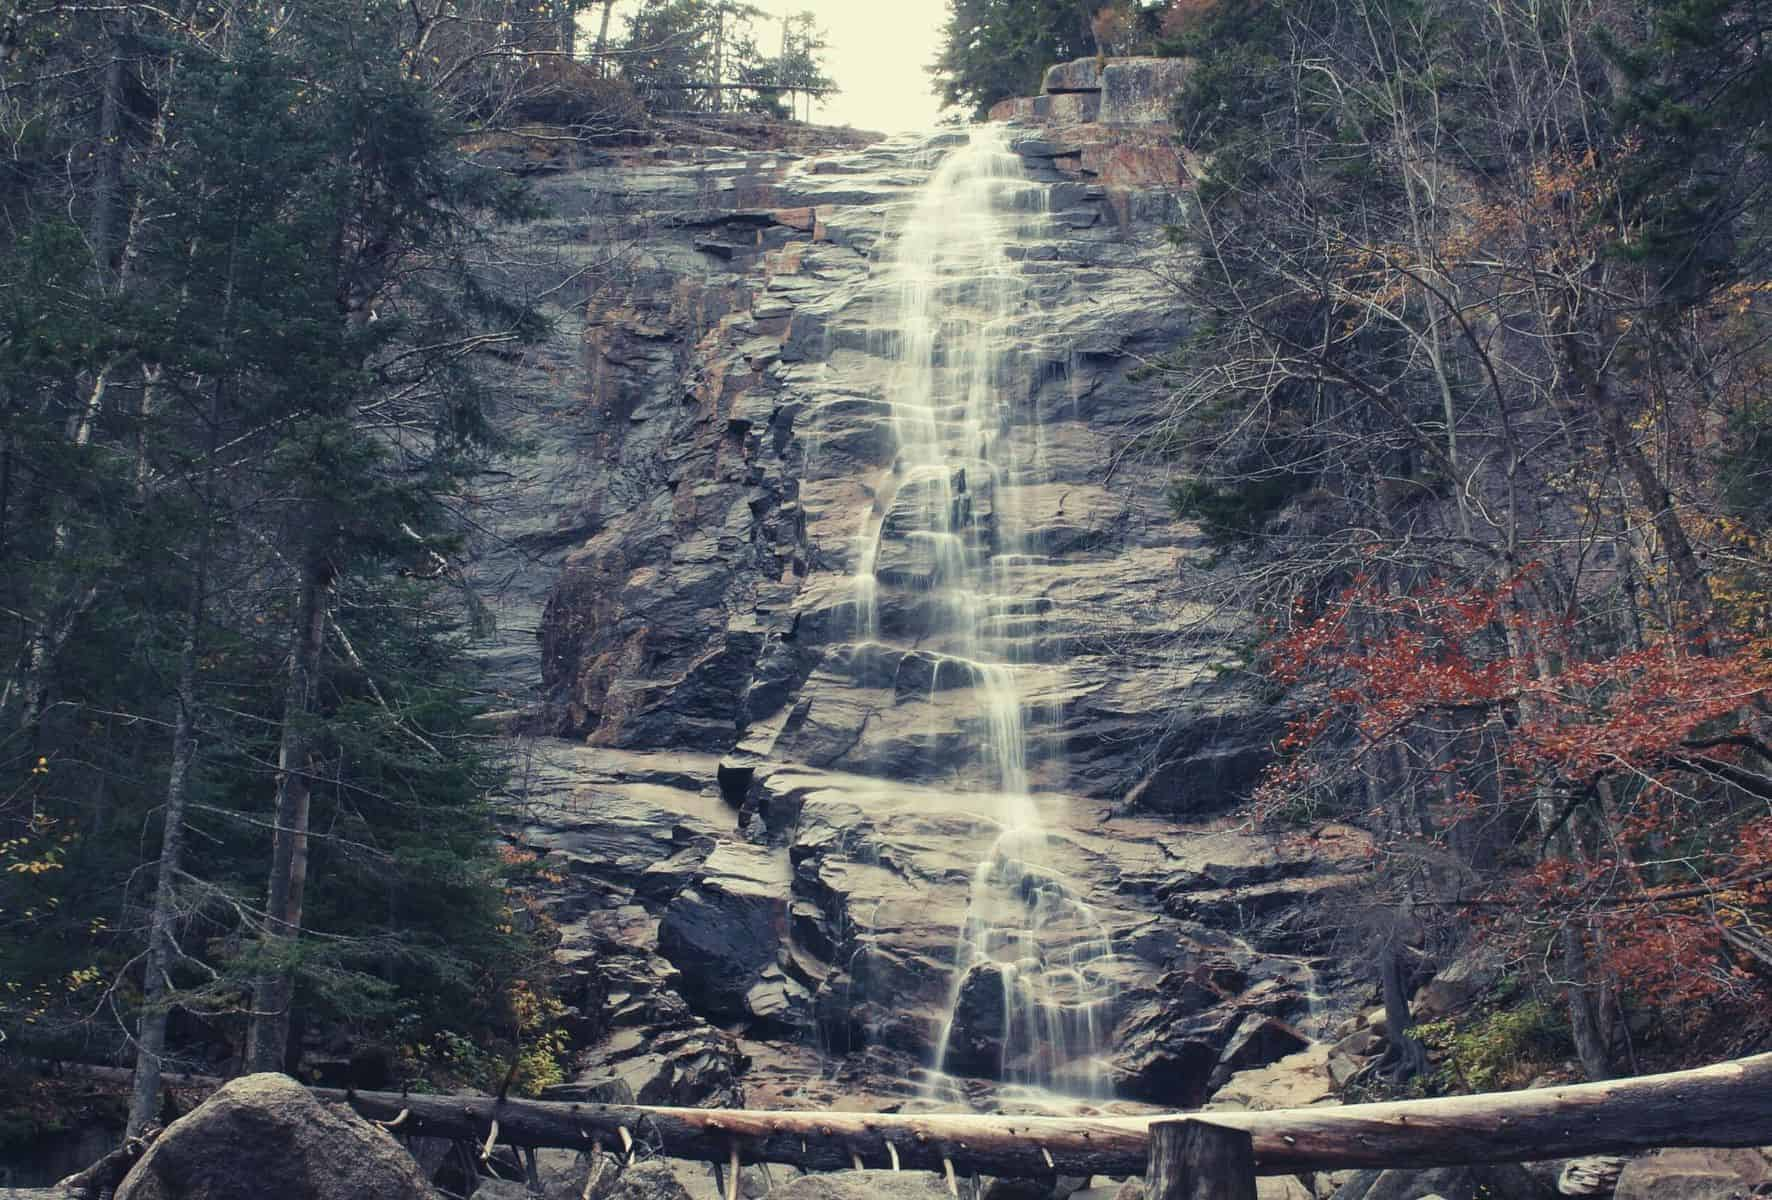 Arethusa Falls Trail Hiking Guide featimage